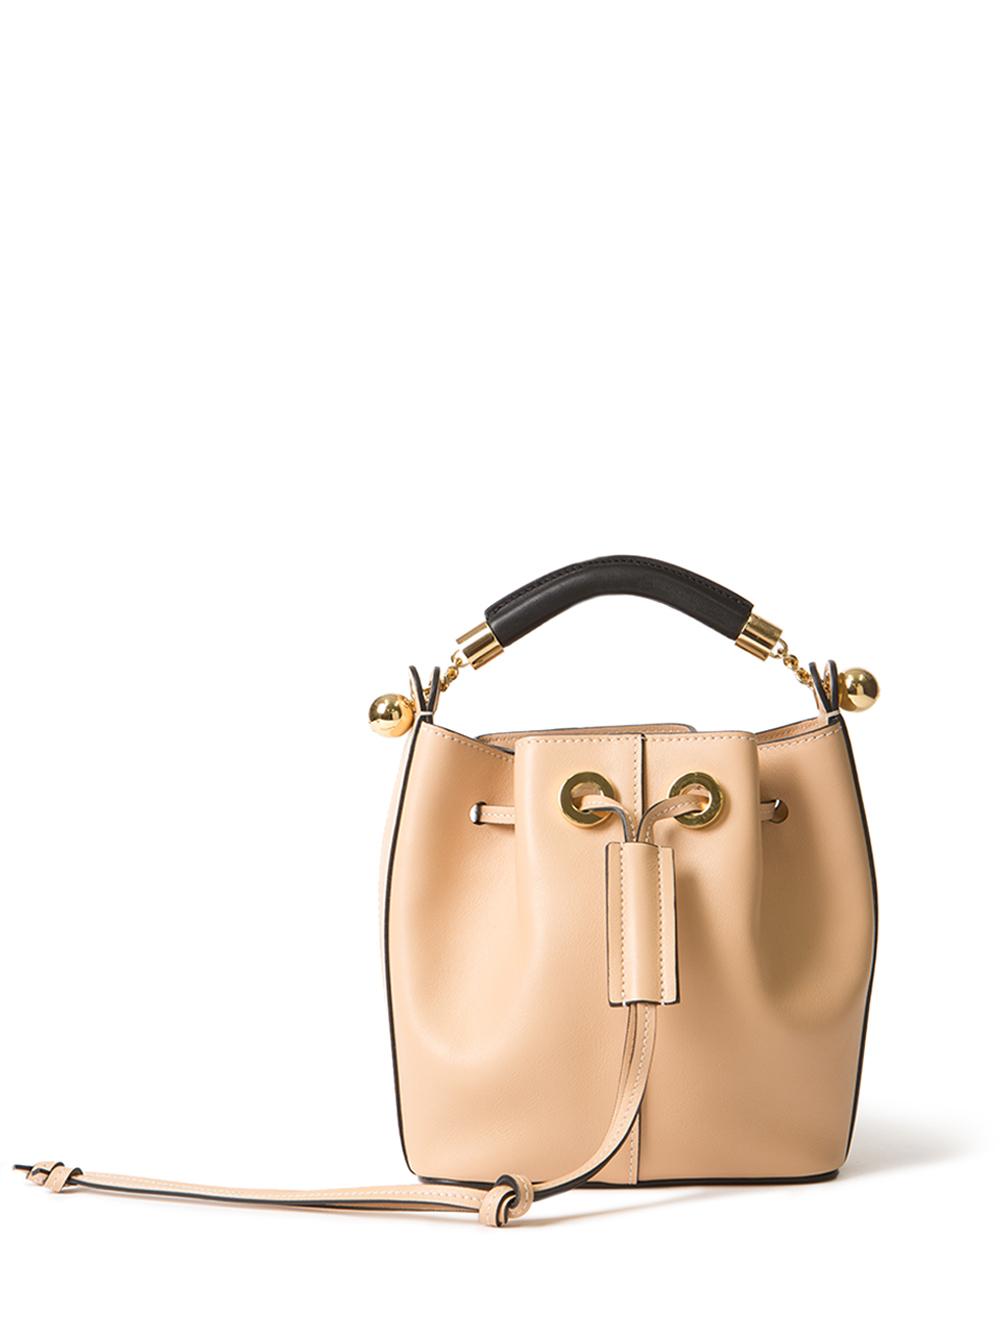 chloe handbags replica - small gala bucket bag in smooth calfskin